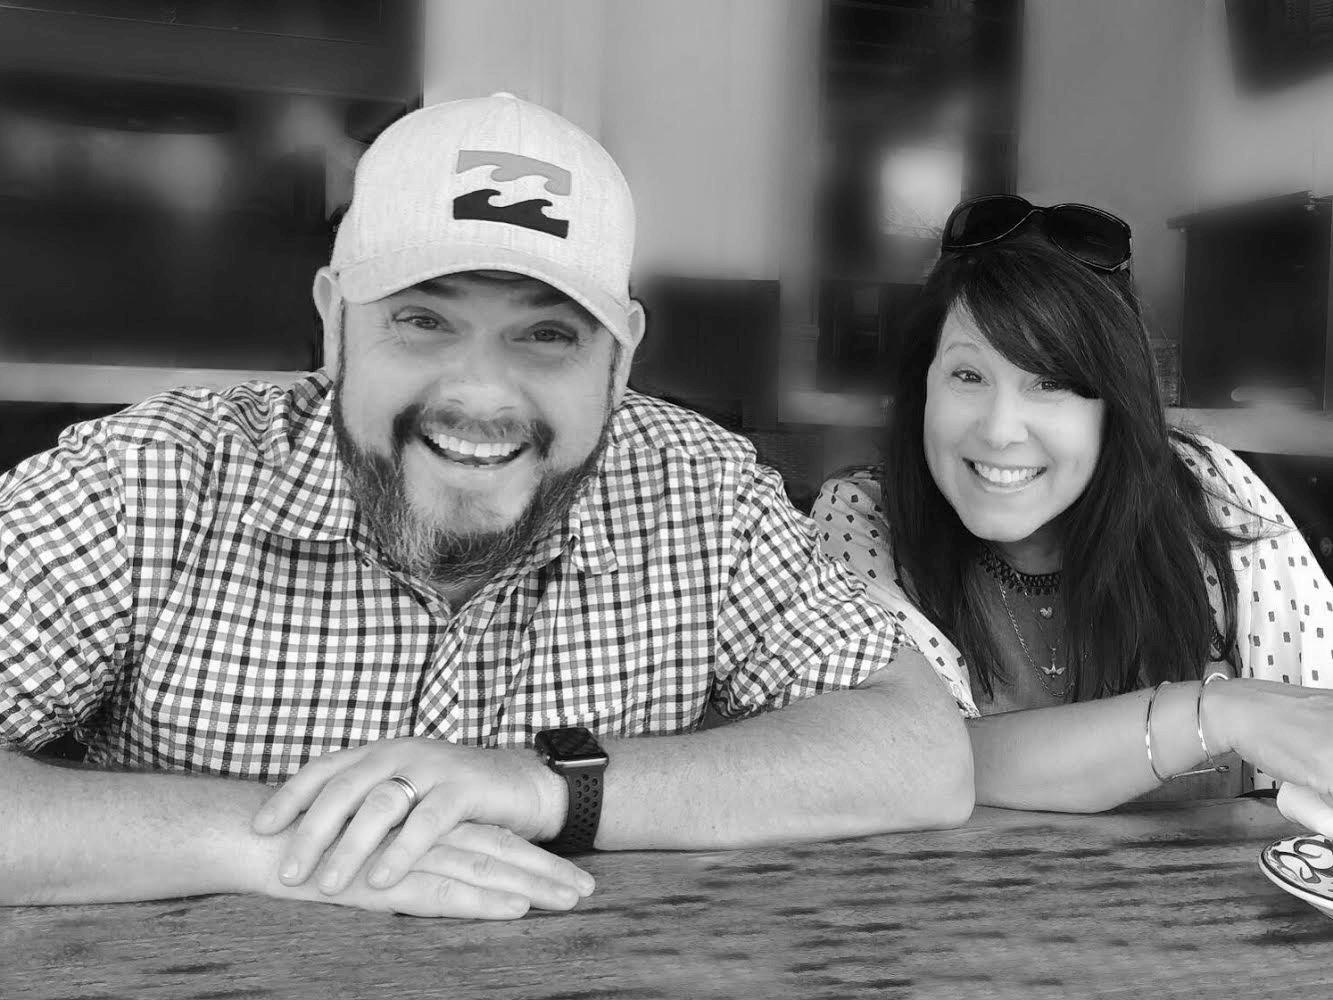 Revival Lending founders - Tyson & Alicia Hilton